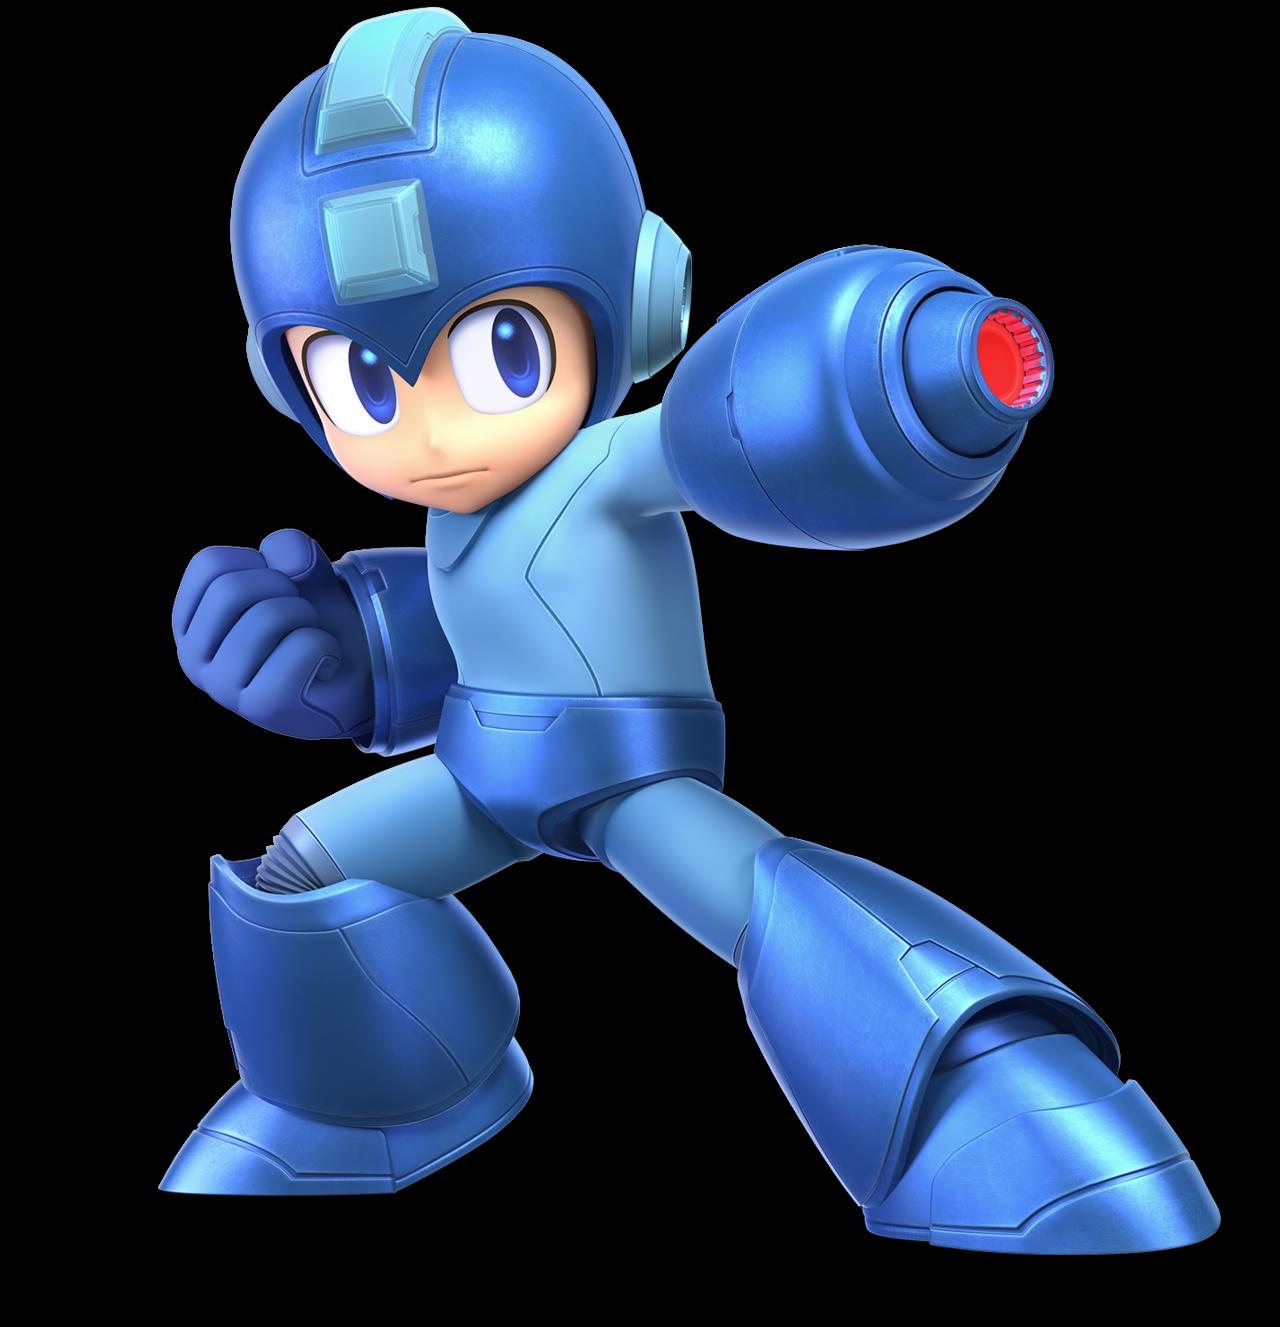 Mega Man (PC) - Crappy Games Wiki